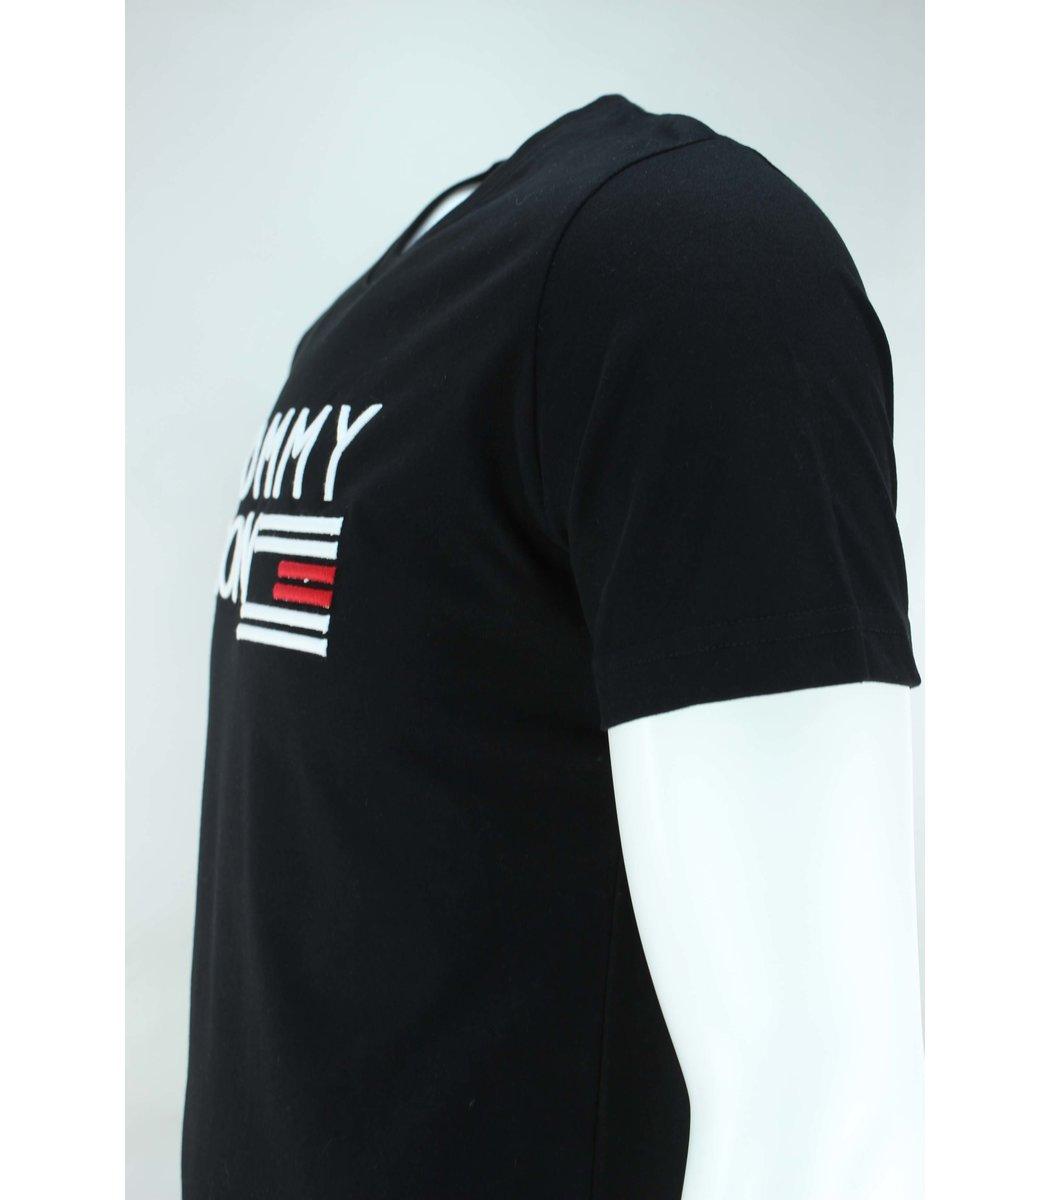 Чёрная футболка Tommy Hilfiger с вышивкой FT2